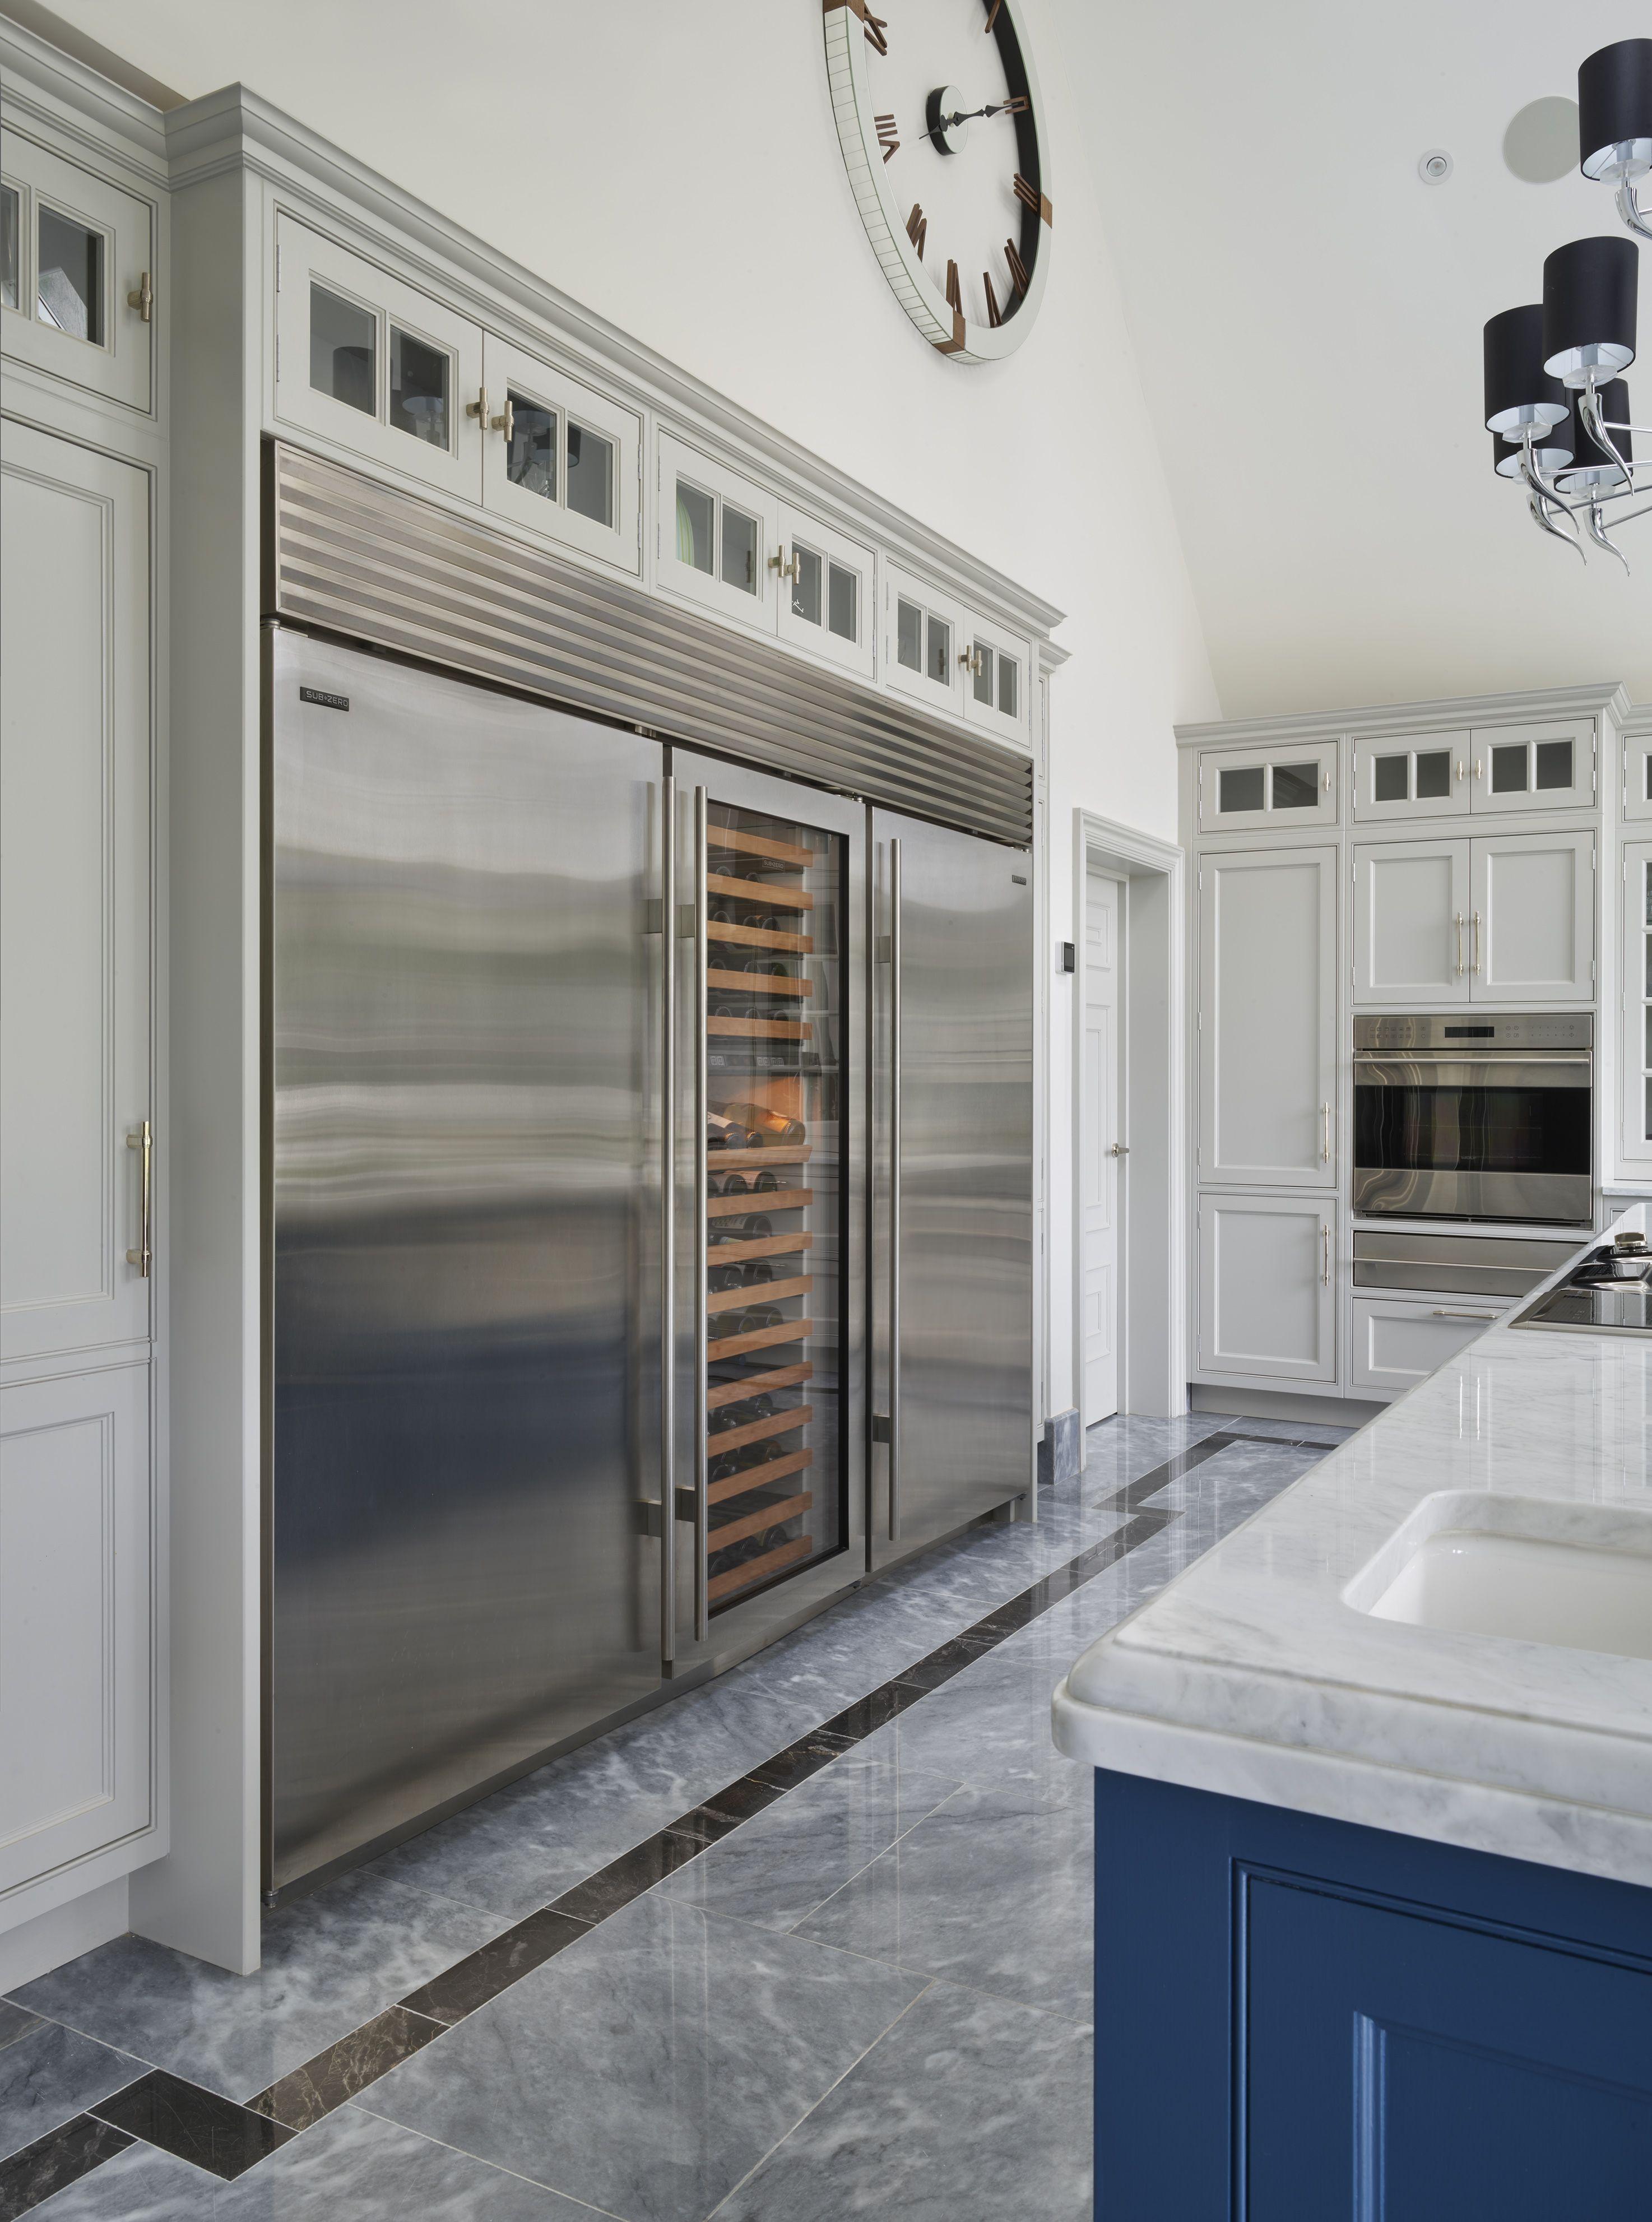 Subzero And Wolf Appliances Including Two Wine Fridges Perfect For Entertainin Applia In 2021 Bauernkuche Interior Modern Fertighauser